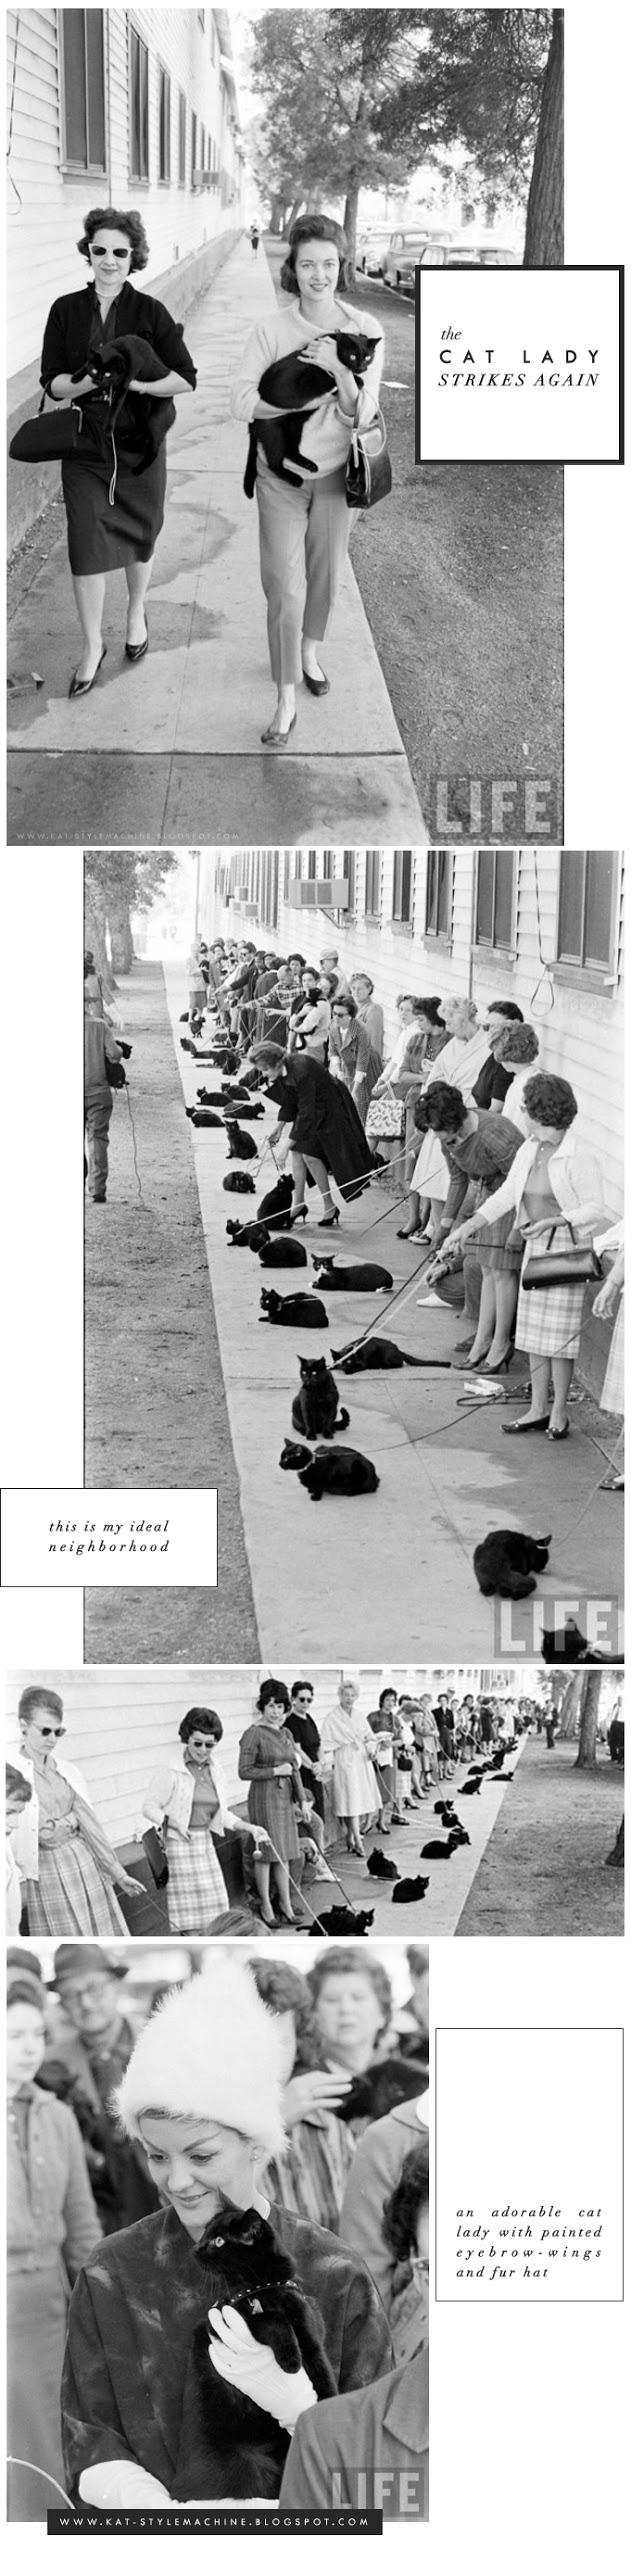 Cat Ladies 1961 Hollywood